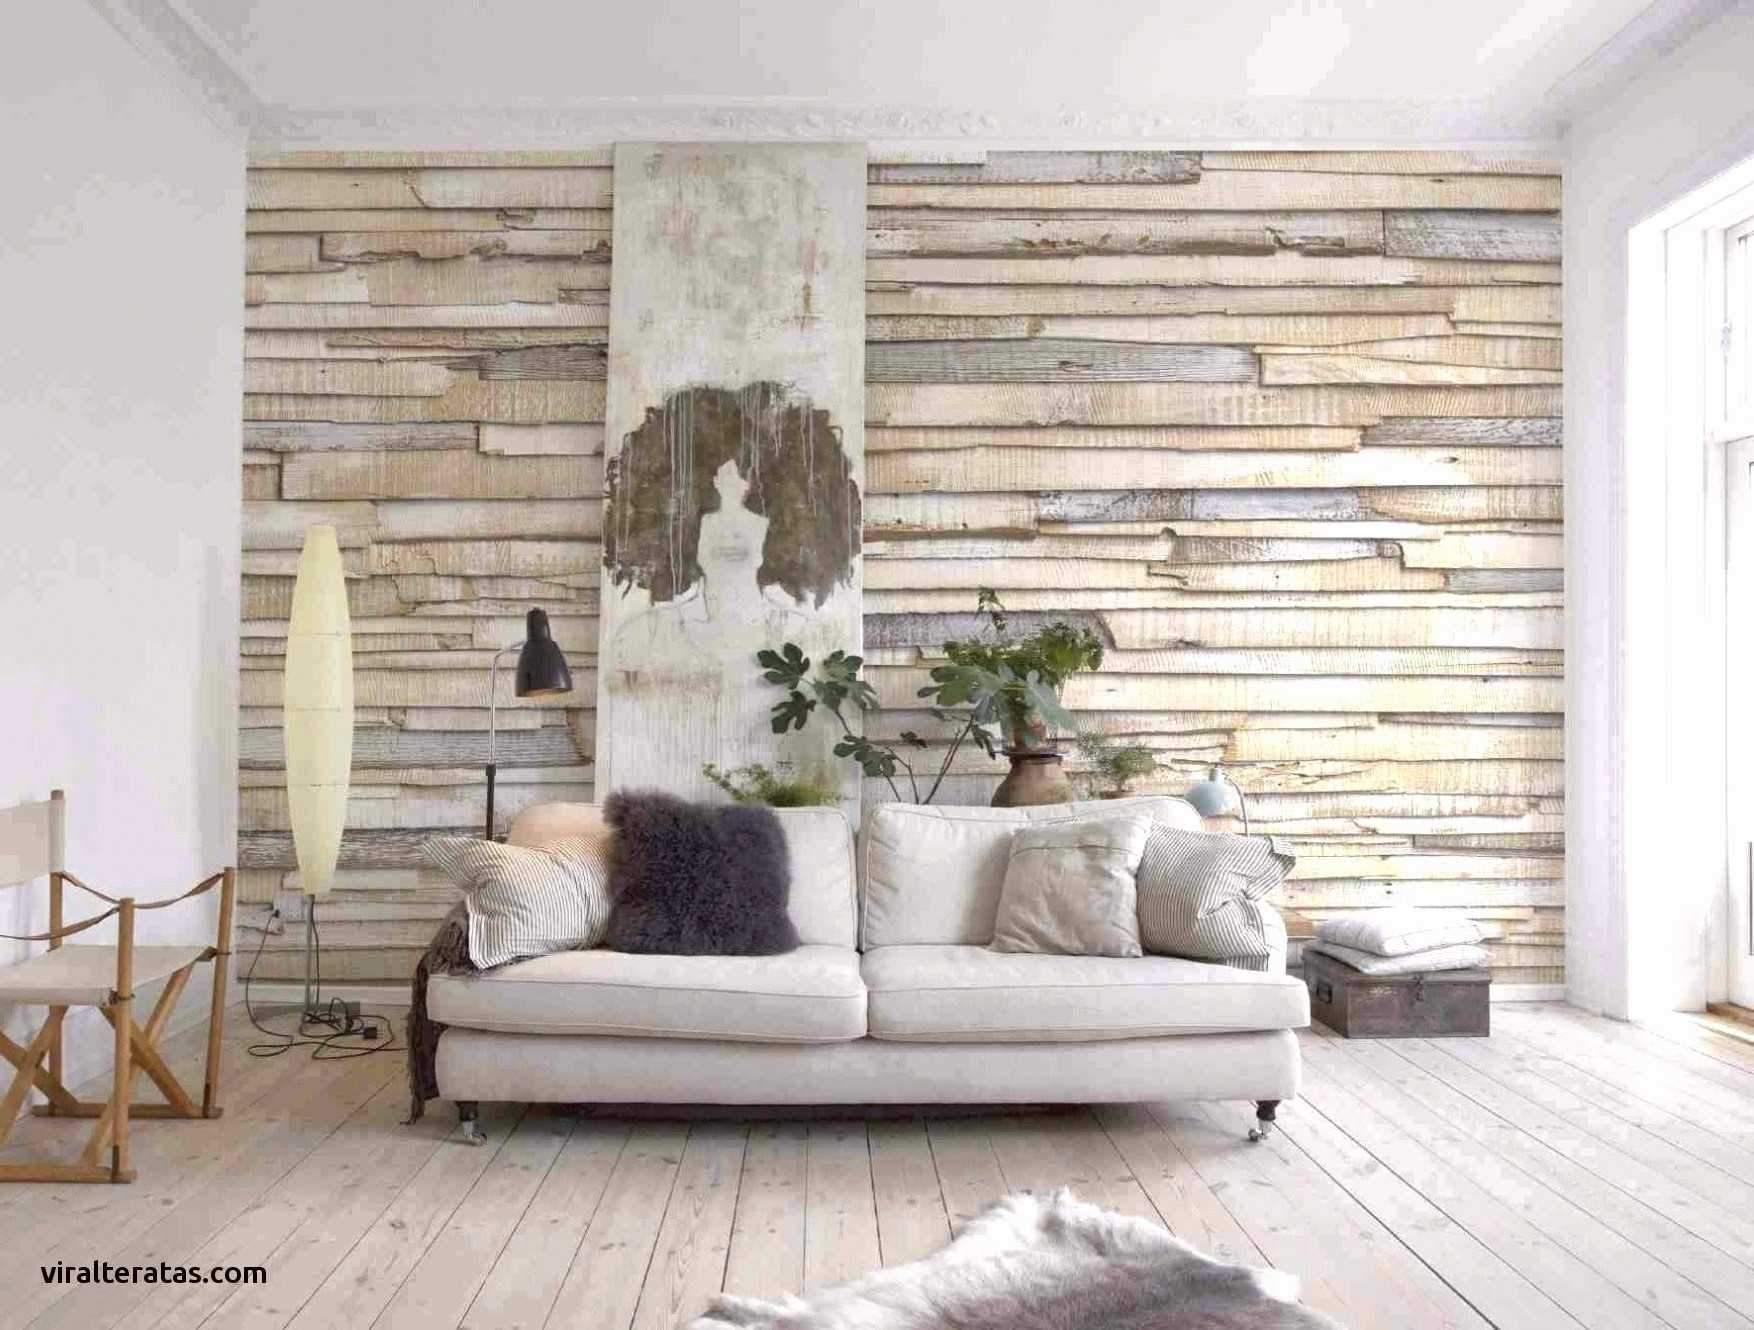 Full Size of 36 Luxus Wohnzimmer Tapeten 2015 Frisch Teppiche Heizkörper Kamin Wandbilder Lampe Anbauwand Sideboard Poster Vinylboden Deckenlampe Deckenleuchte Wohnzimmer Tapete Wohnzimmer